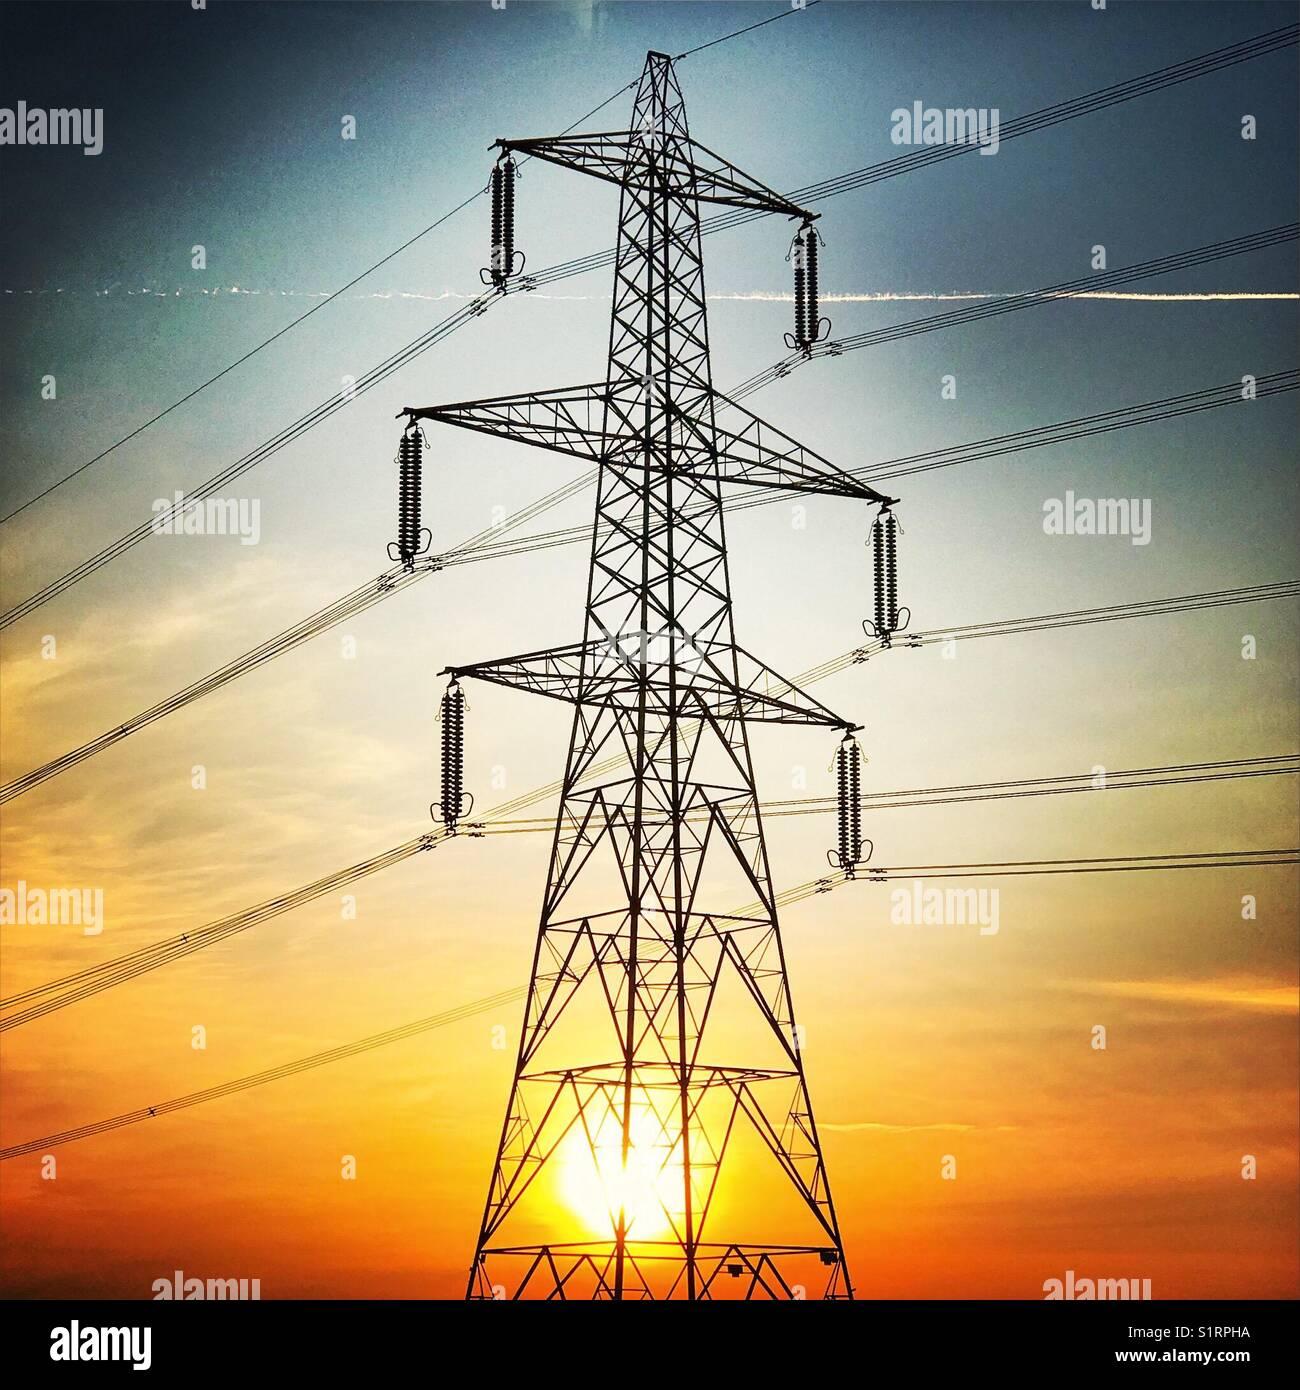 Electricity pylonStock Photo